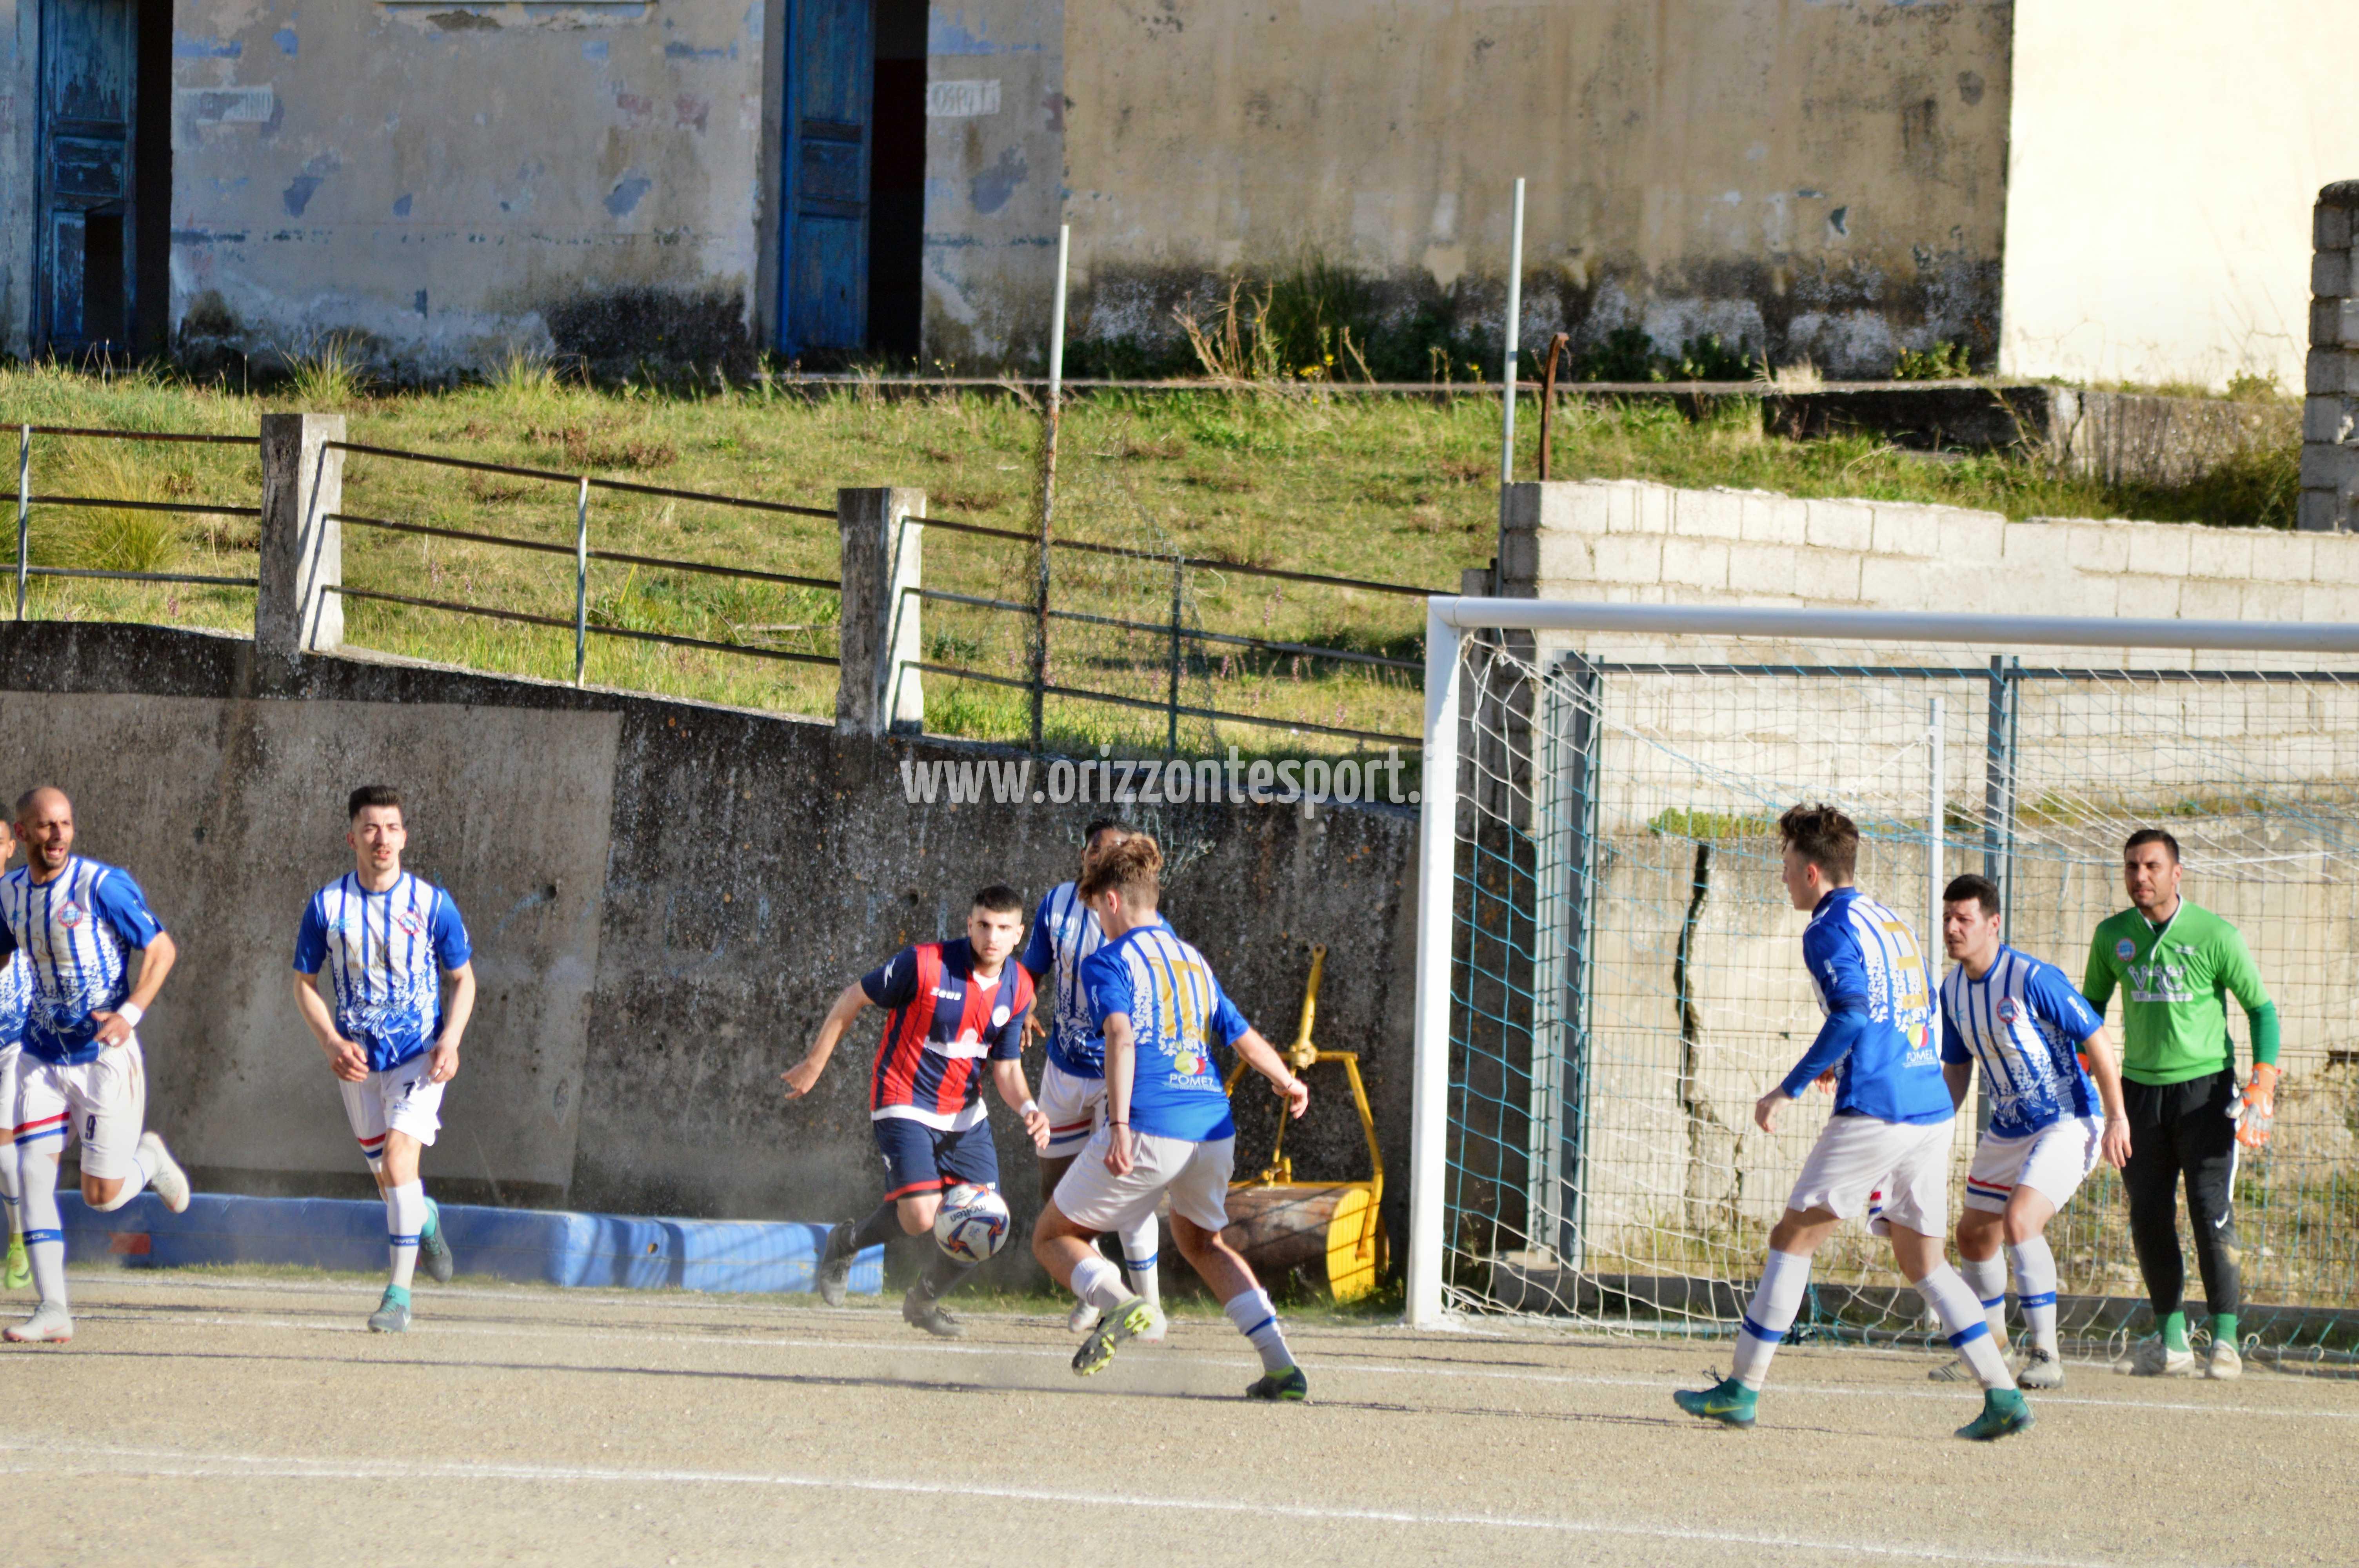 cassano_rossanese (146)